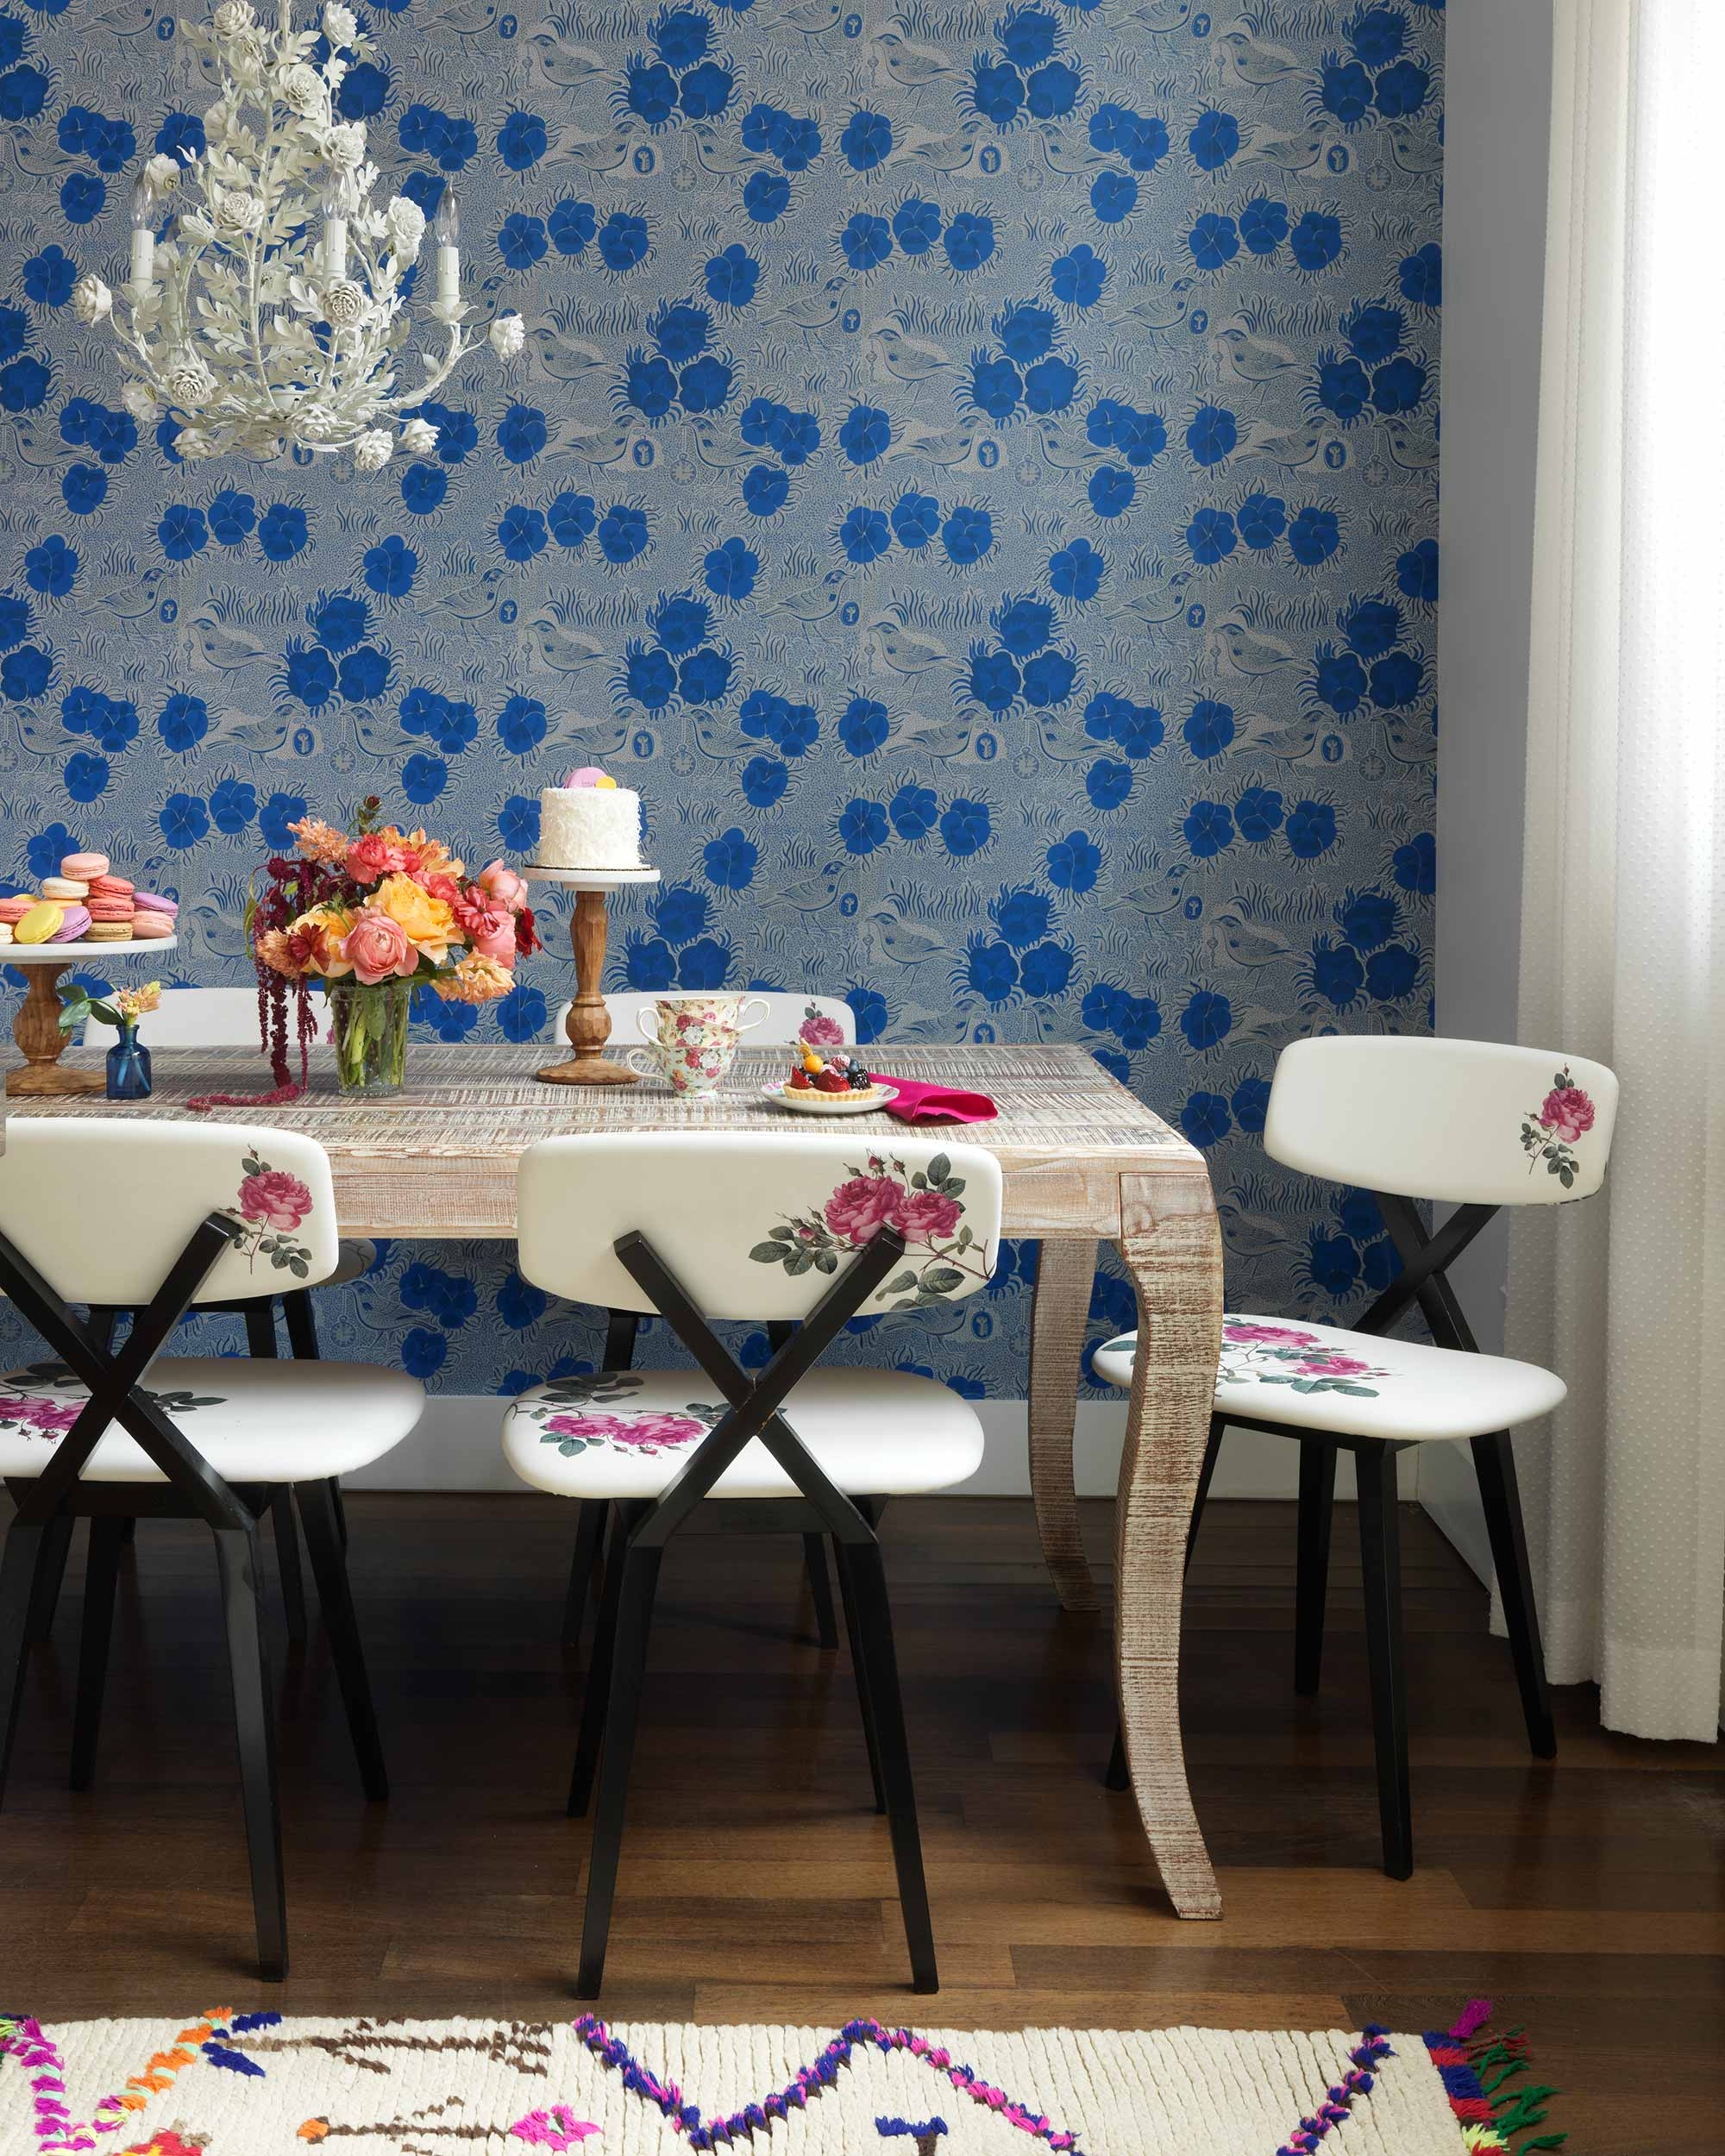 Dining_Room_wallpaper_chandelier_roses.jpg